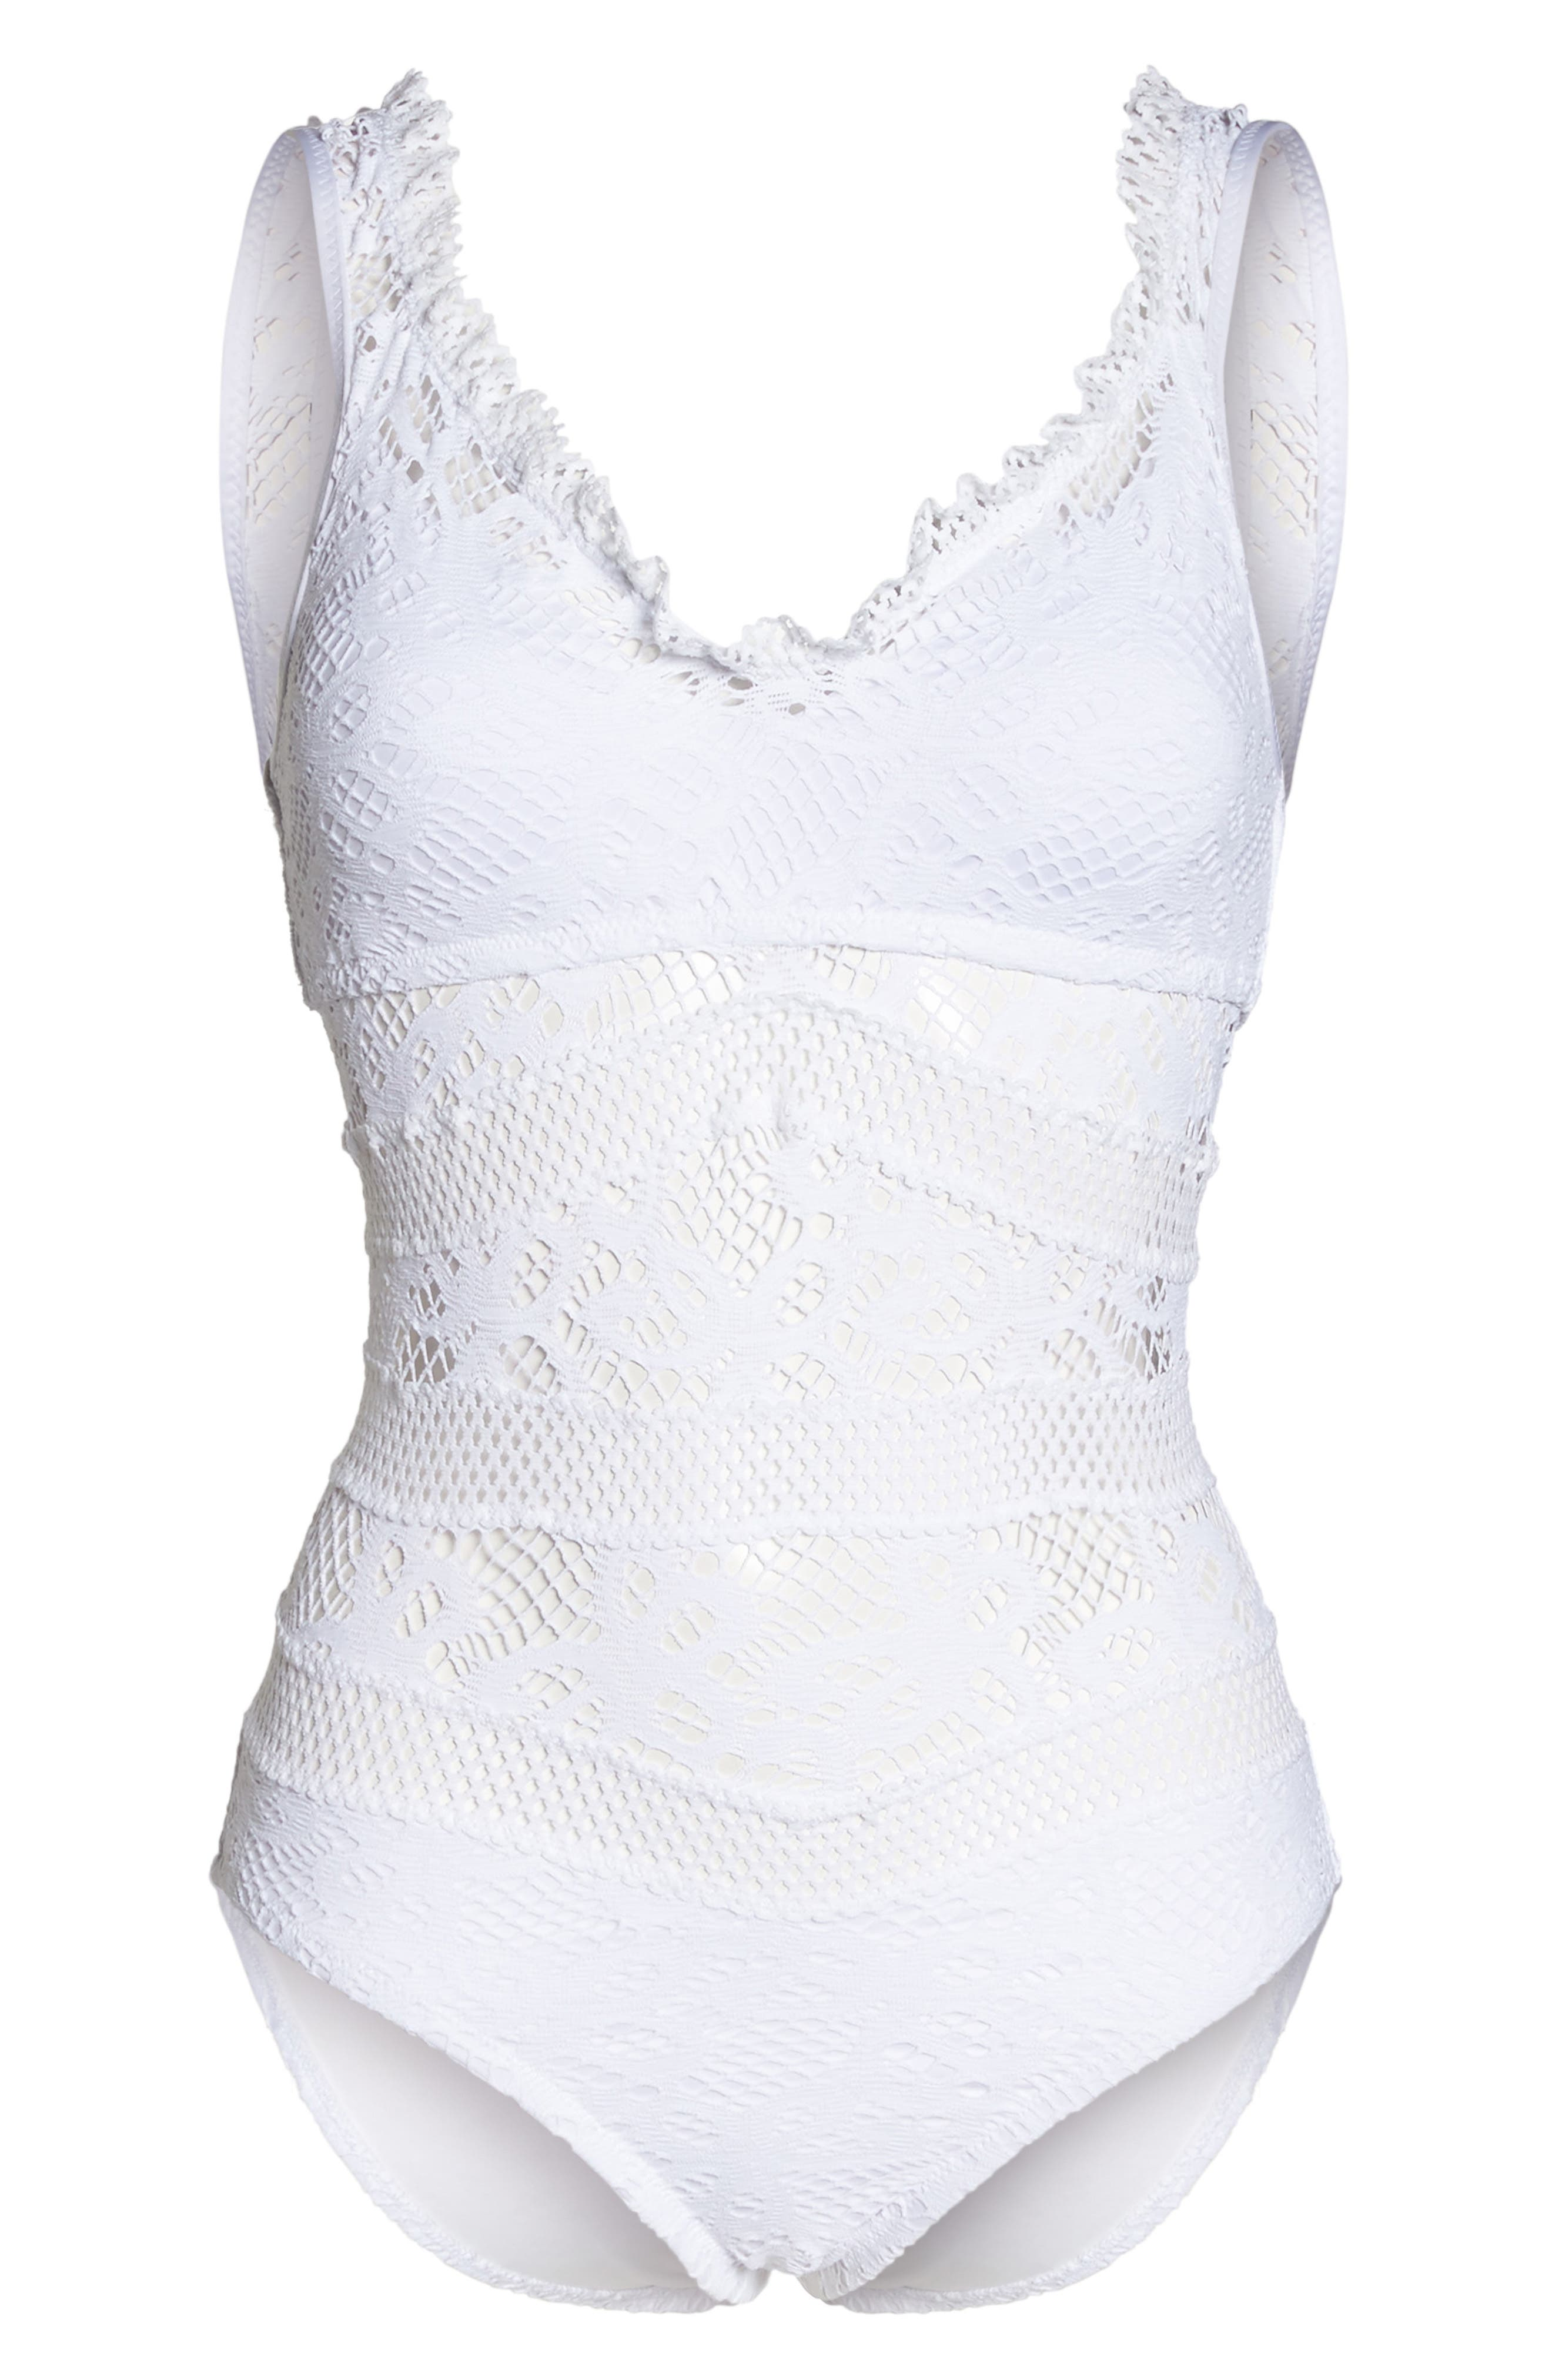 Color Play Crochet One-Piece Swimsuit,                             Alternate thumbnail 6, color,                             White